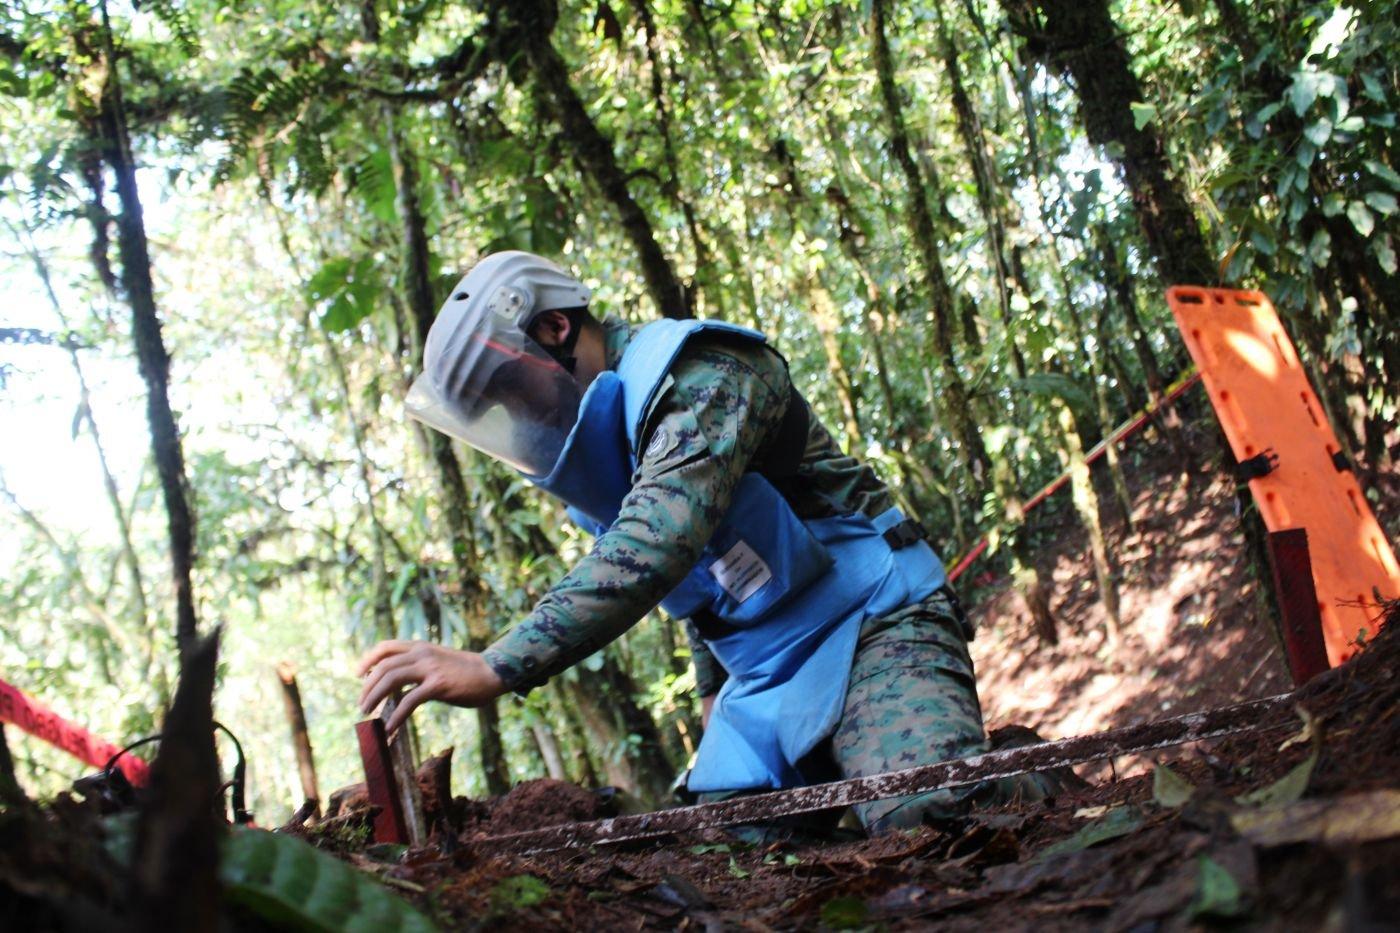 Ecuador and Peru Deactivate Mines along Shared Border